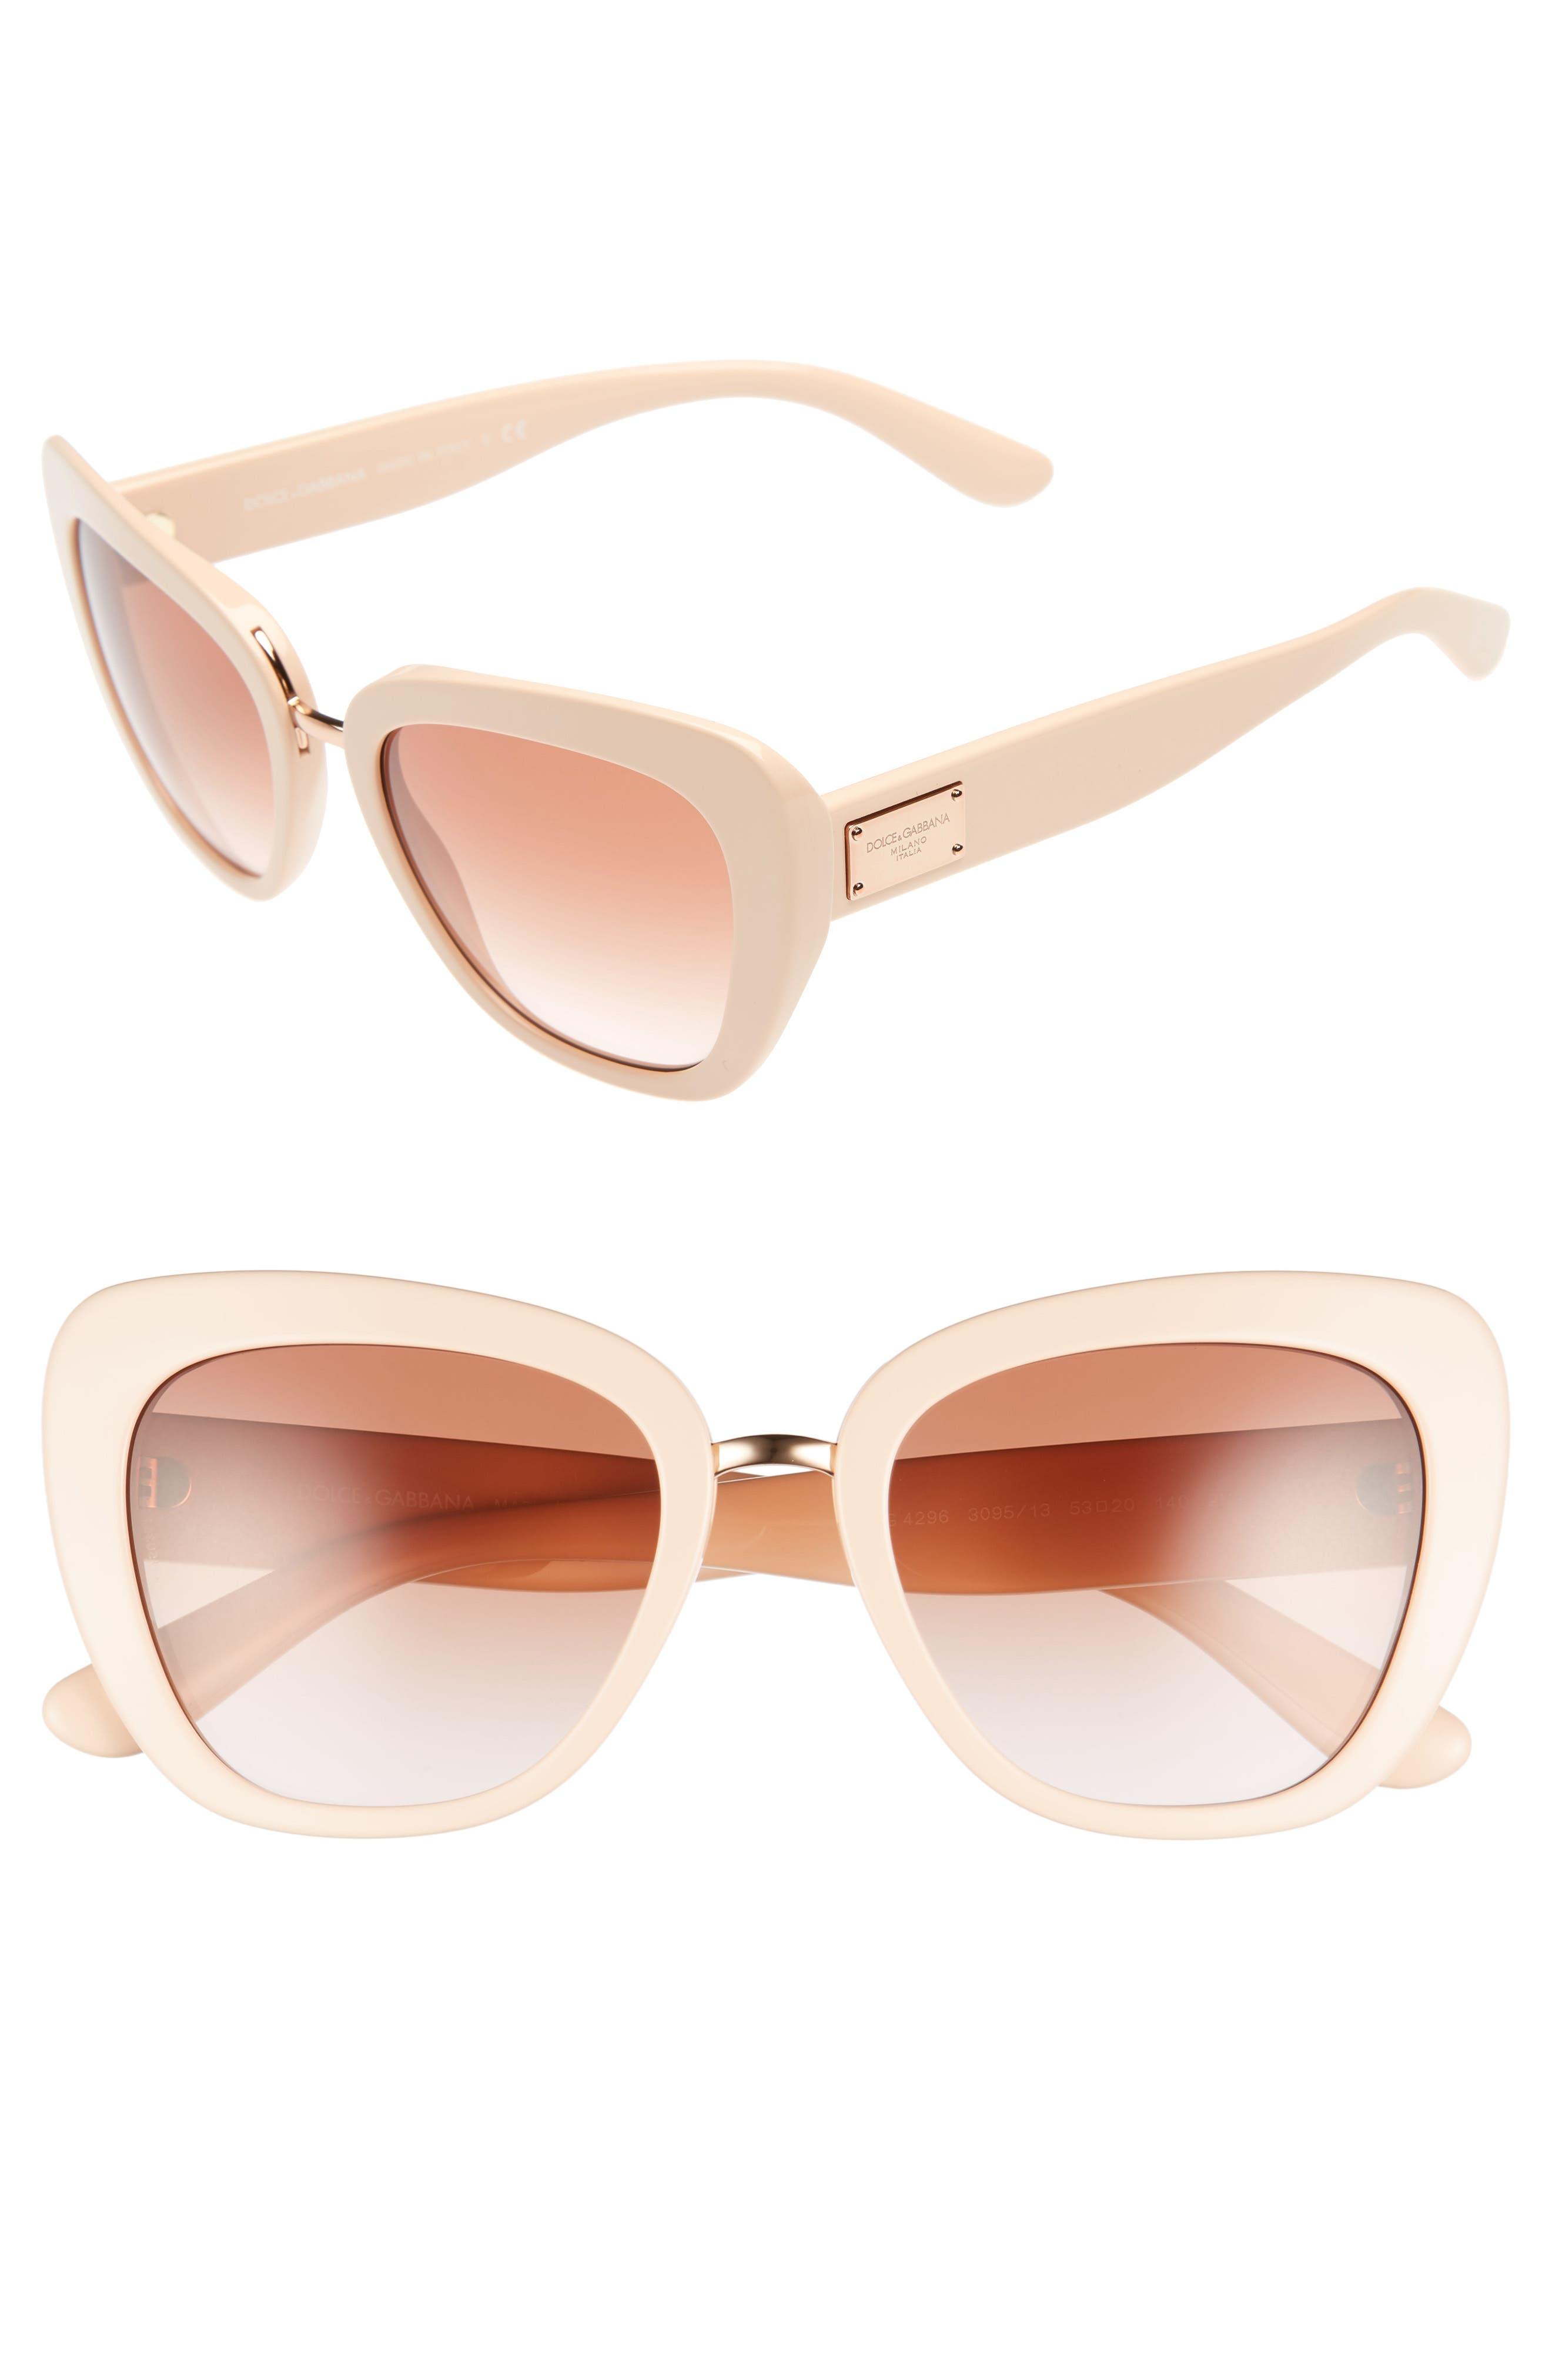 Main Image - Dolce&Gabbana 53mm Gradient Cat Eye Sunglasses